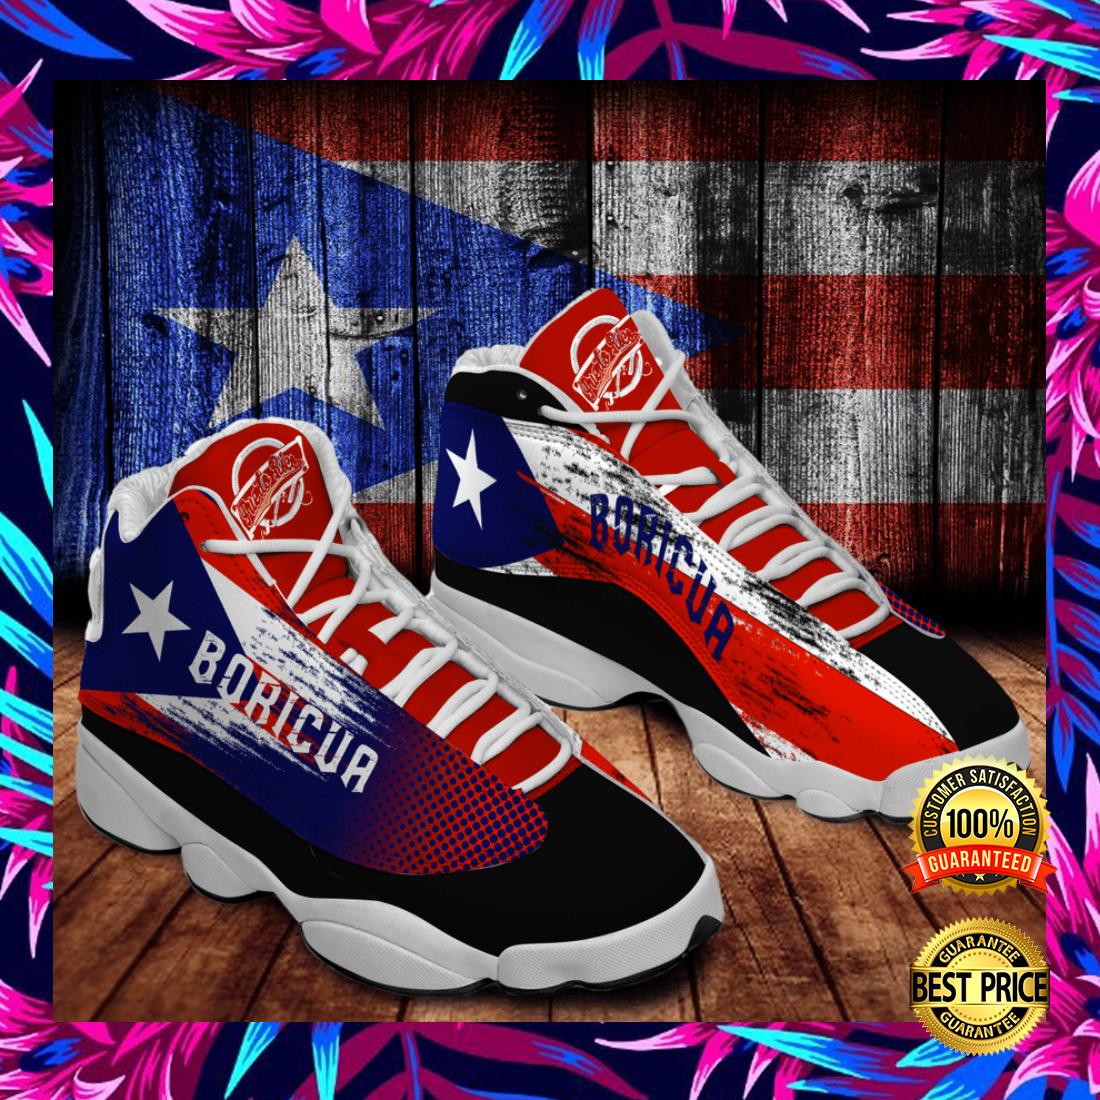 Personalized Puerto Rico flag Jordan 13 shoes 5